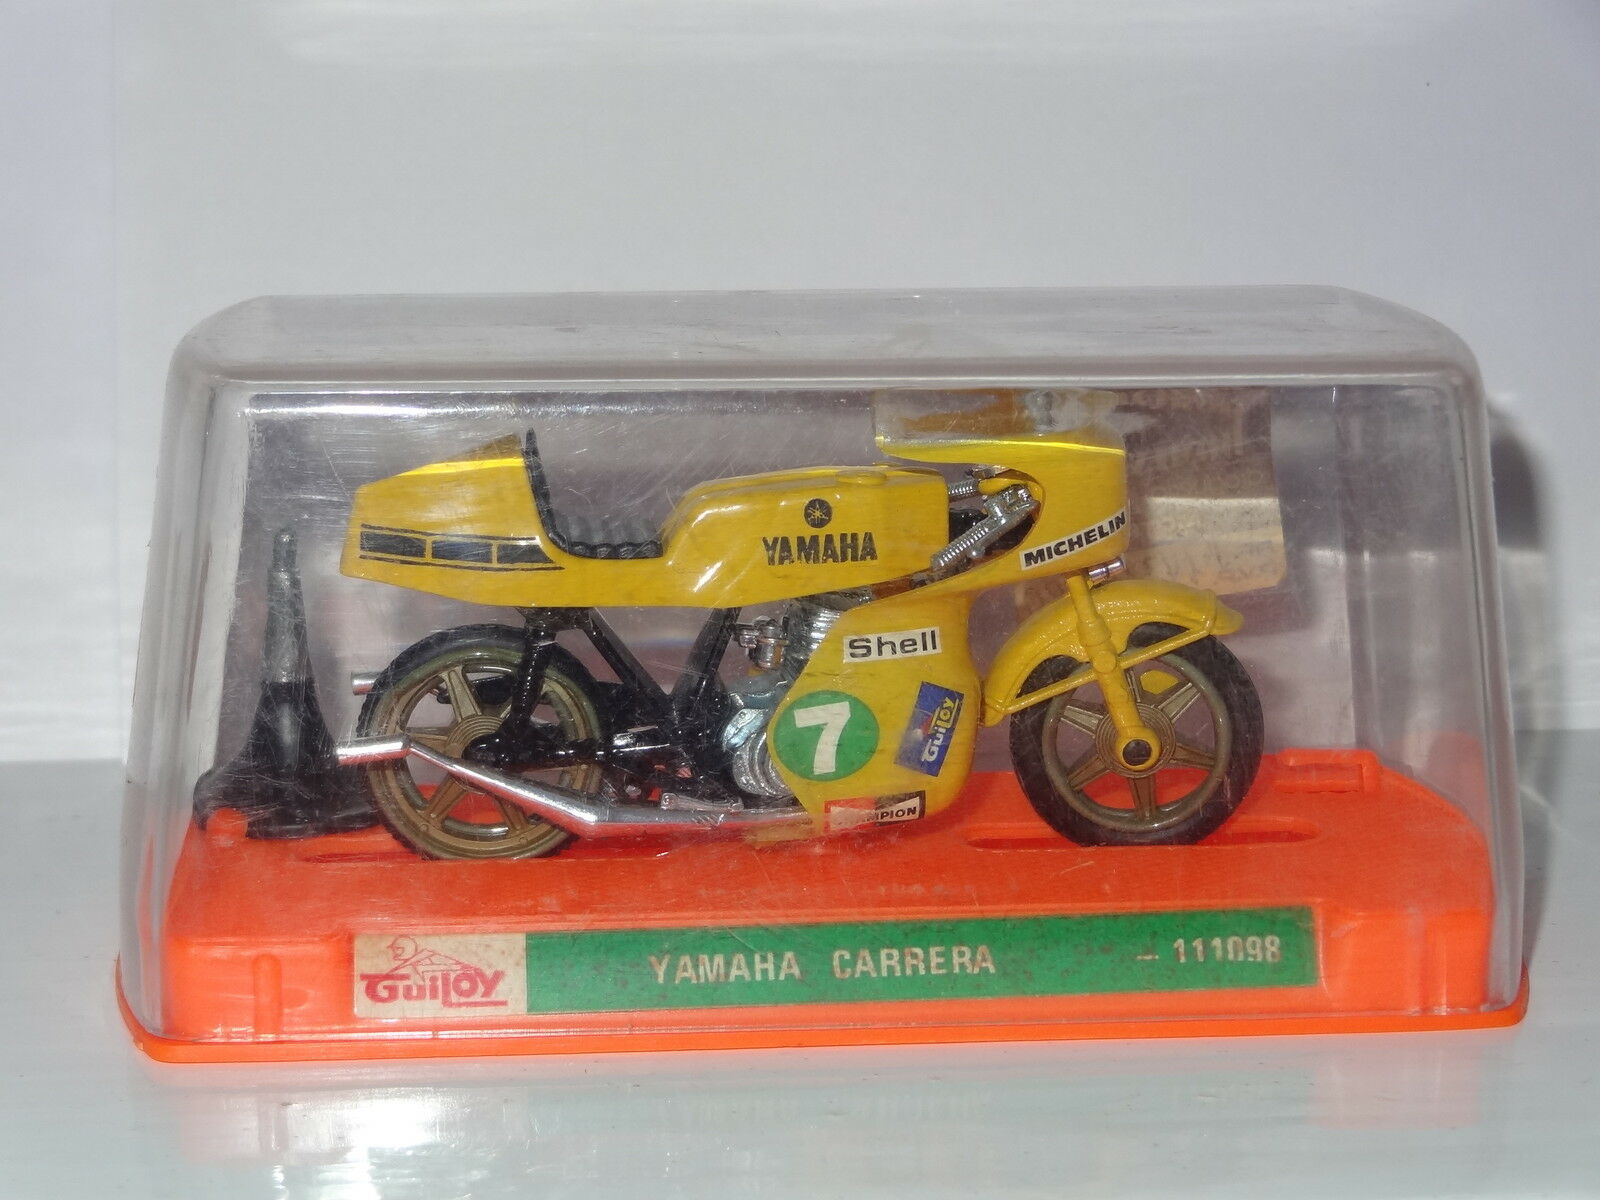 GUILOY SPAIN YAMAHA CARRERA MOTORCYCLE